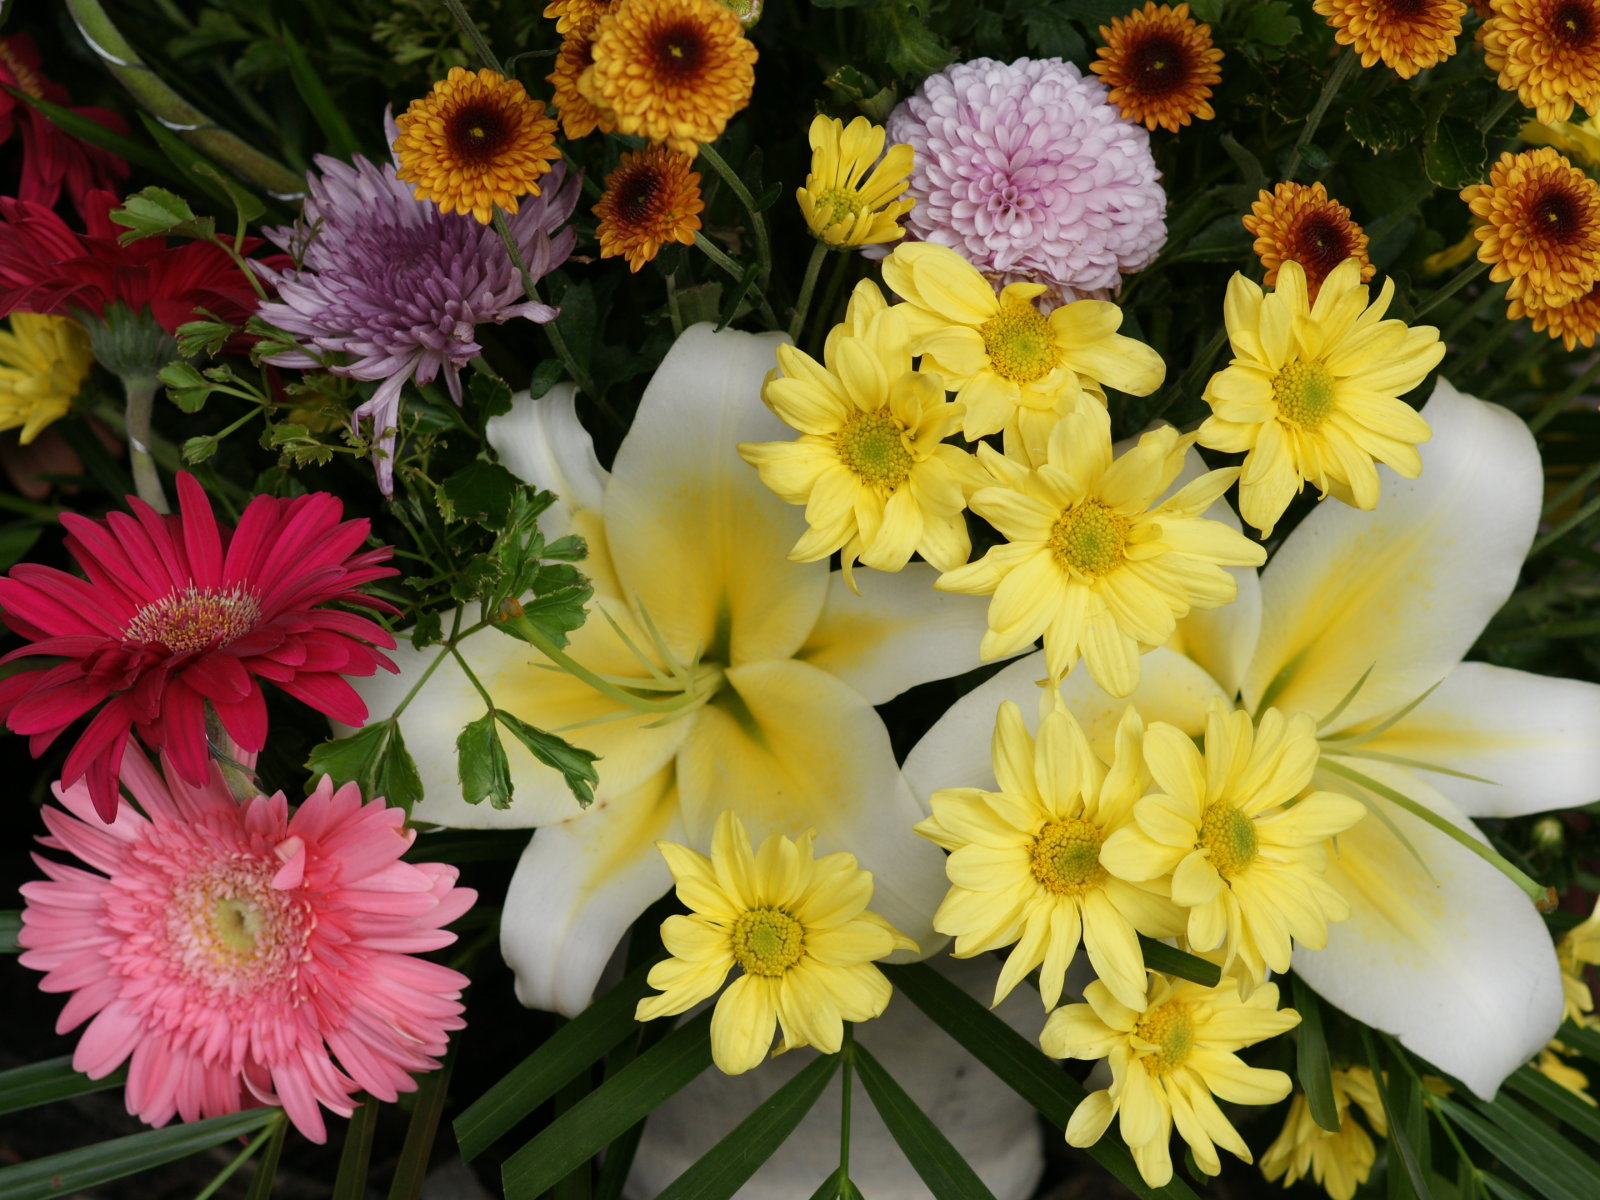 Flowers for flower lovers flowers wallpapers flowers wallpapers izmirmasajfo